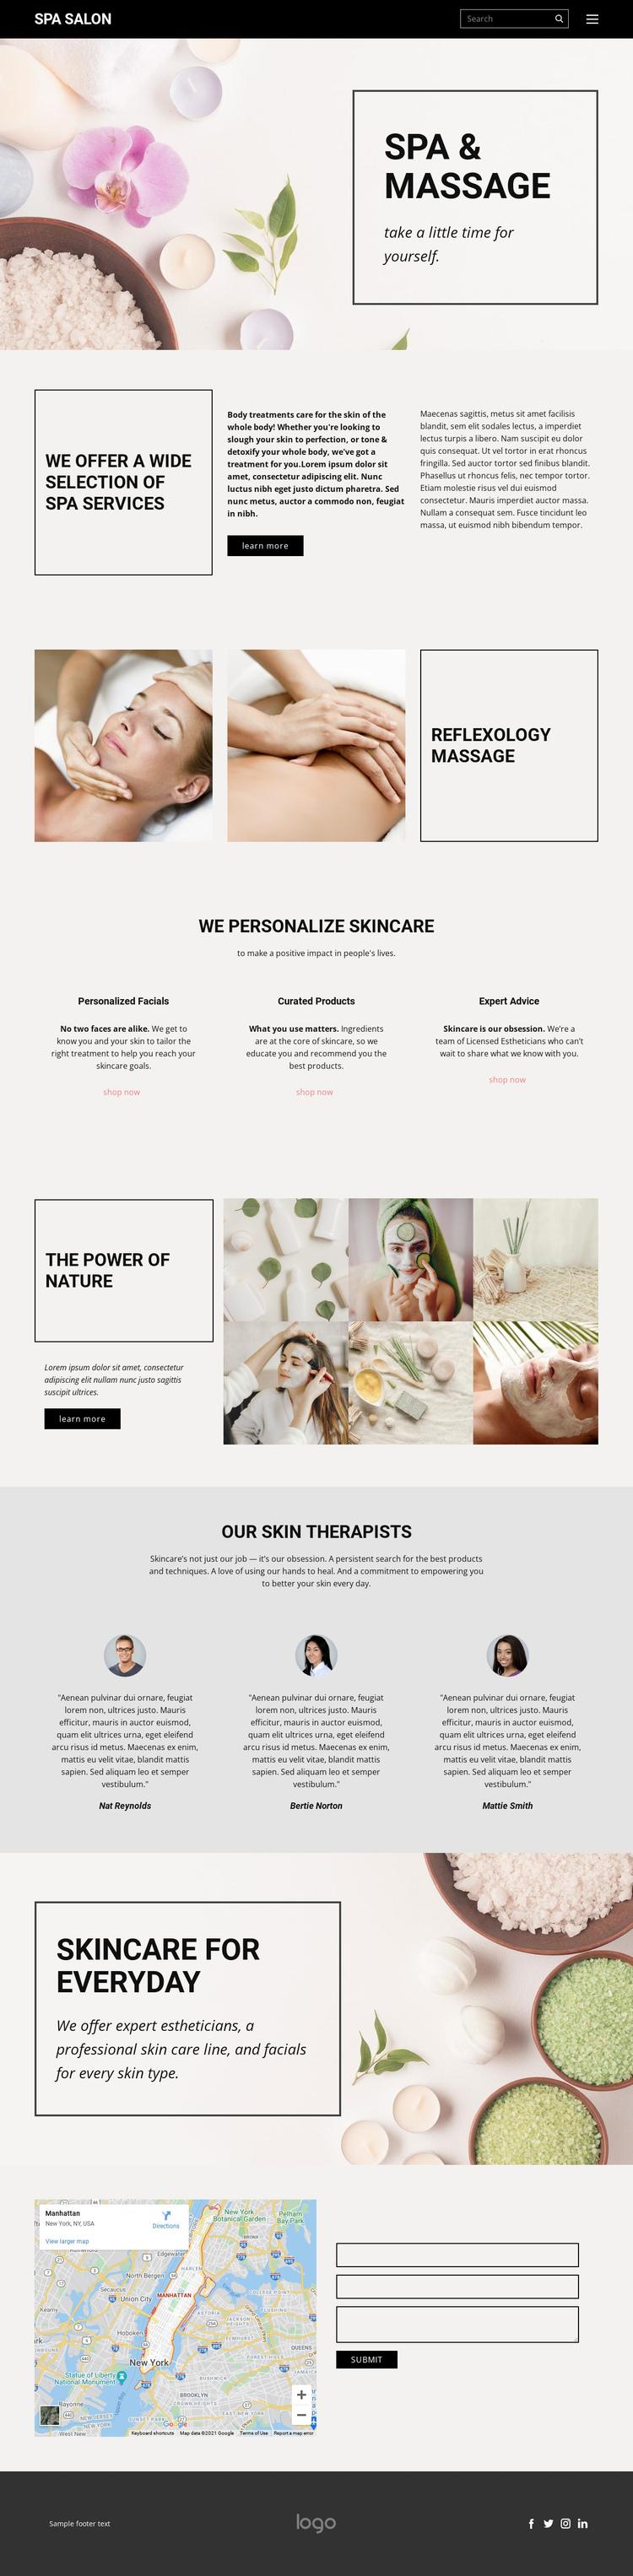 SPA and massage Website Builder Software